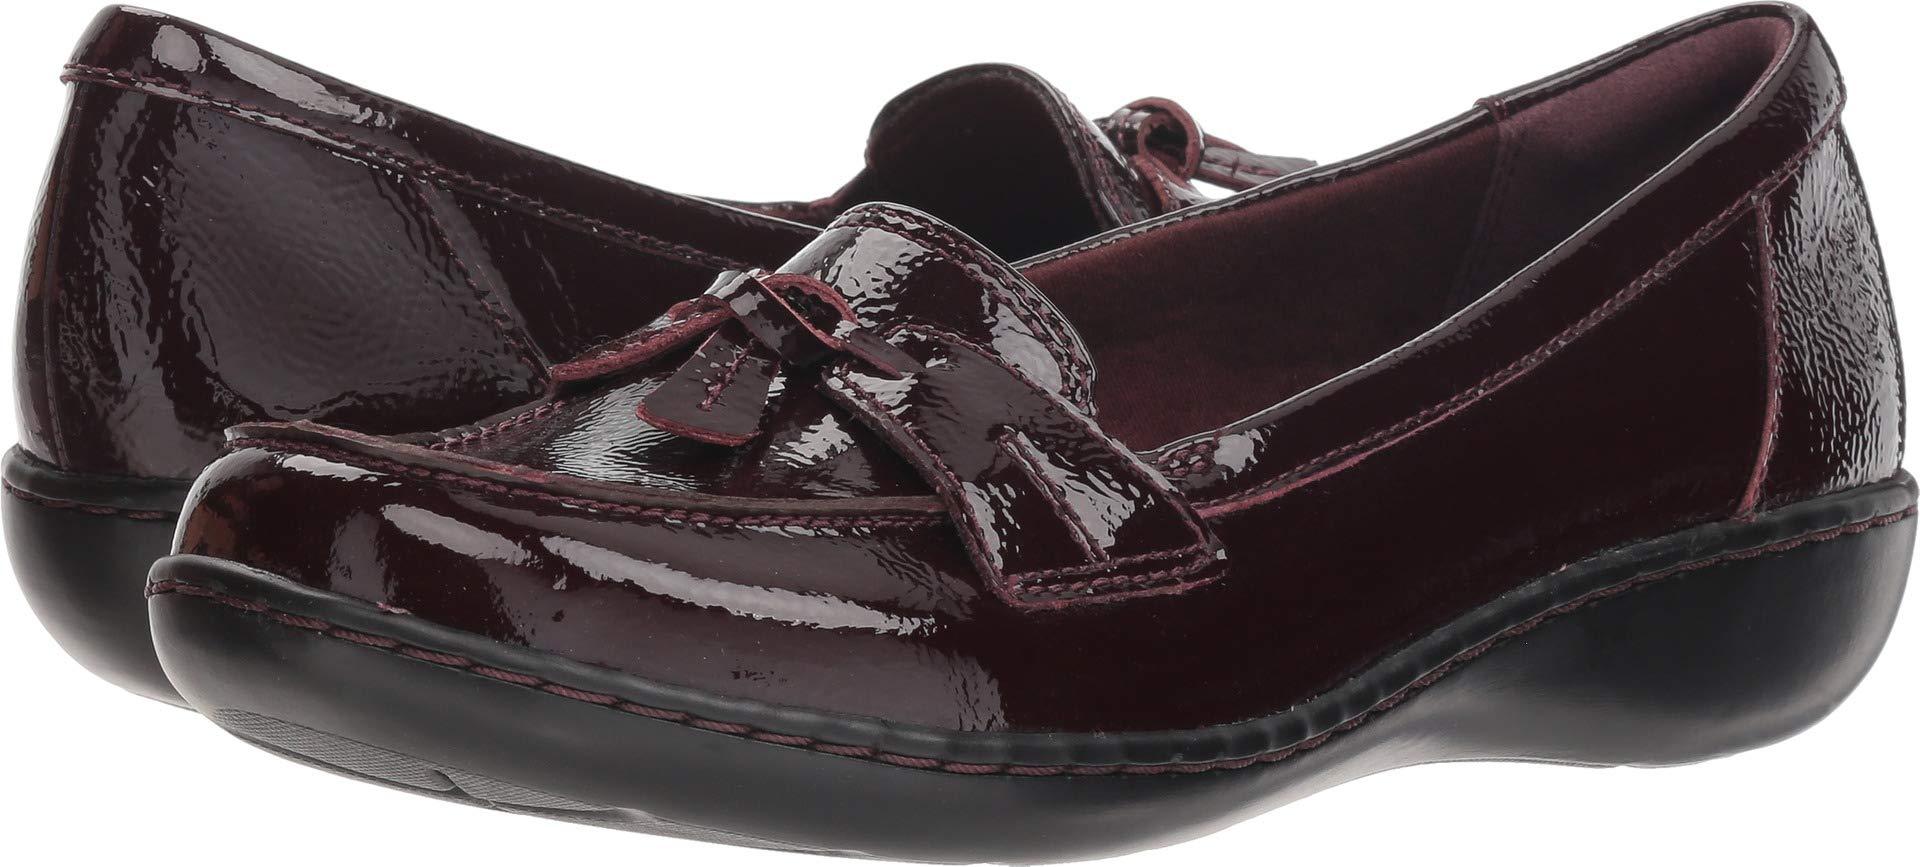 CLARKS Women's Ashland Bubble Burgundy Patent Leather 9.5 B US B (M)